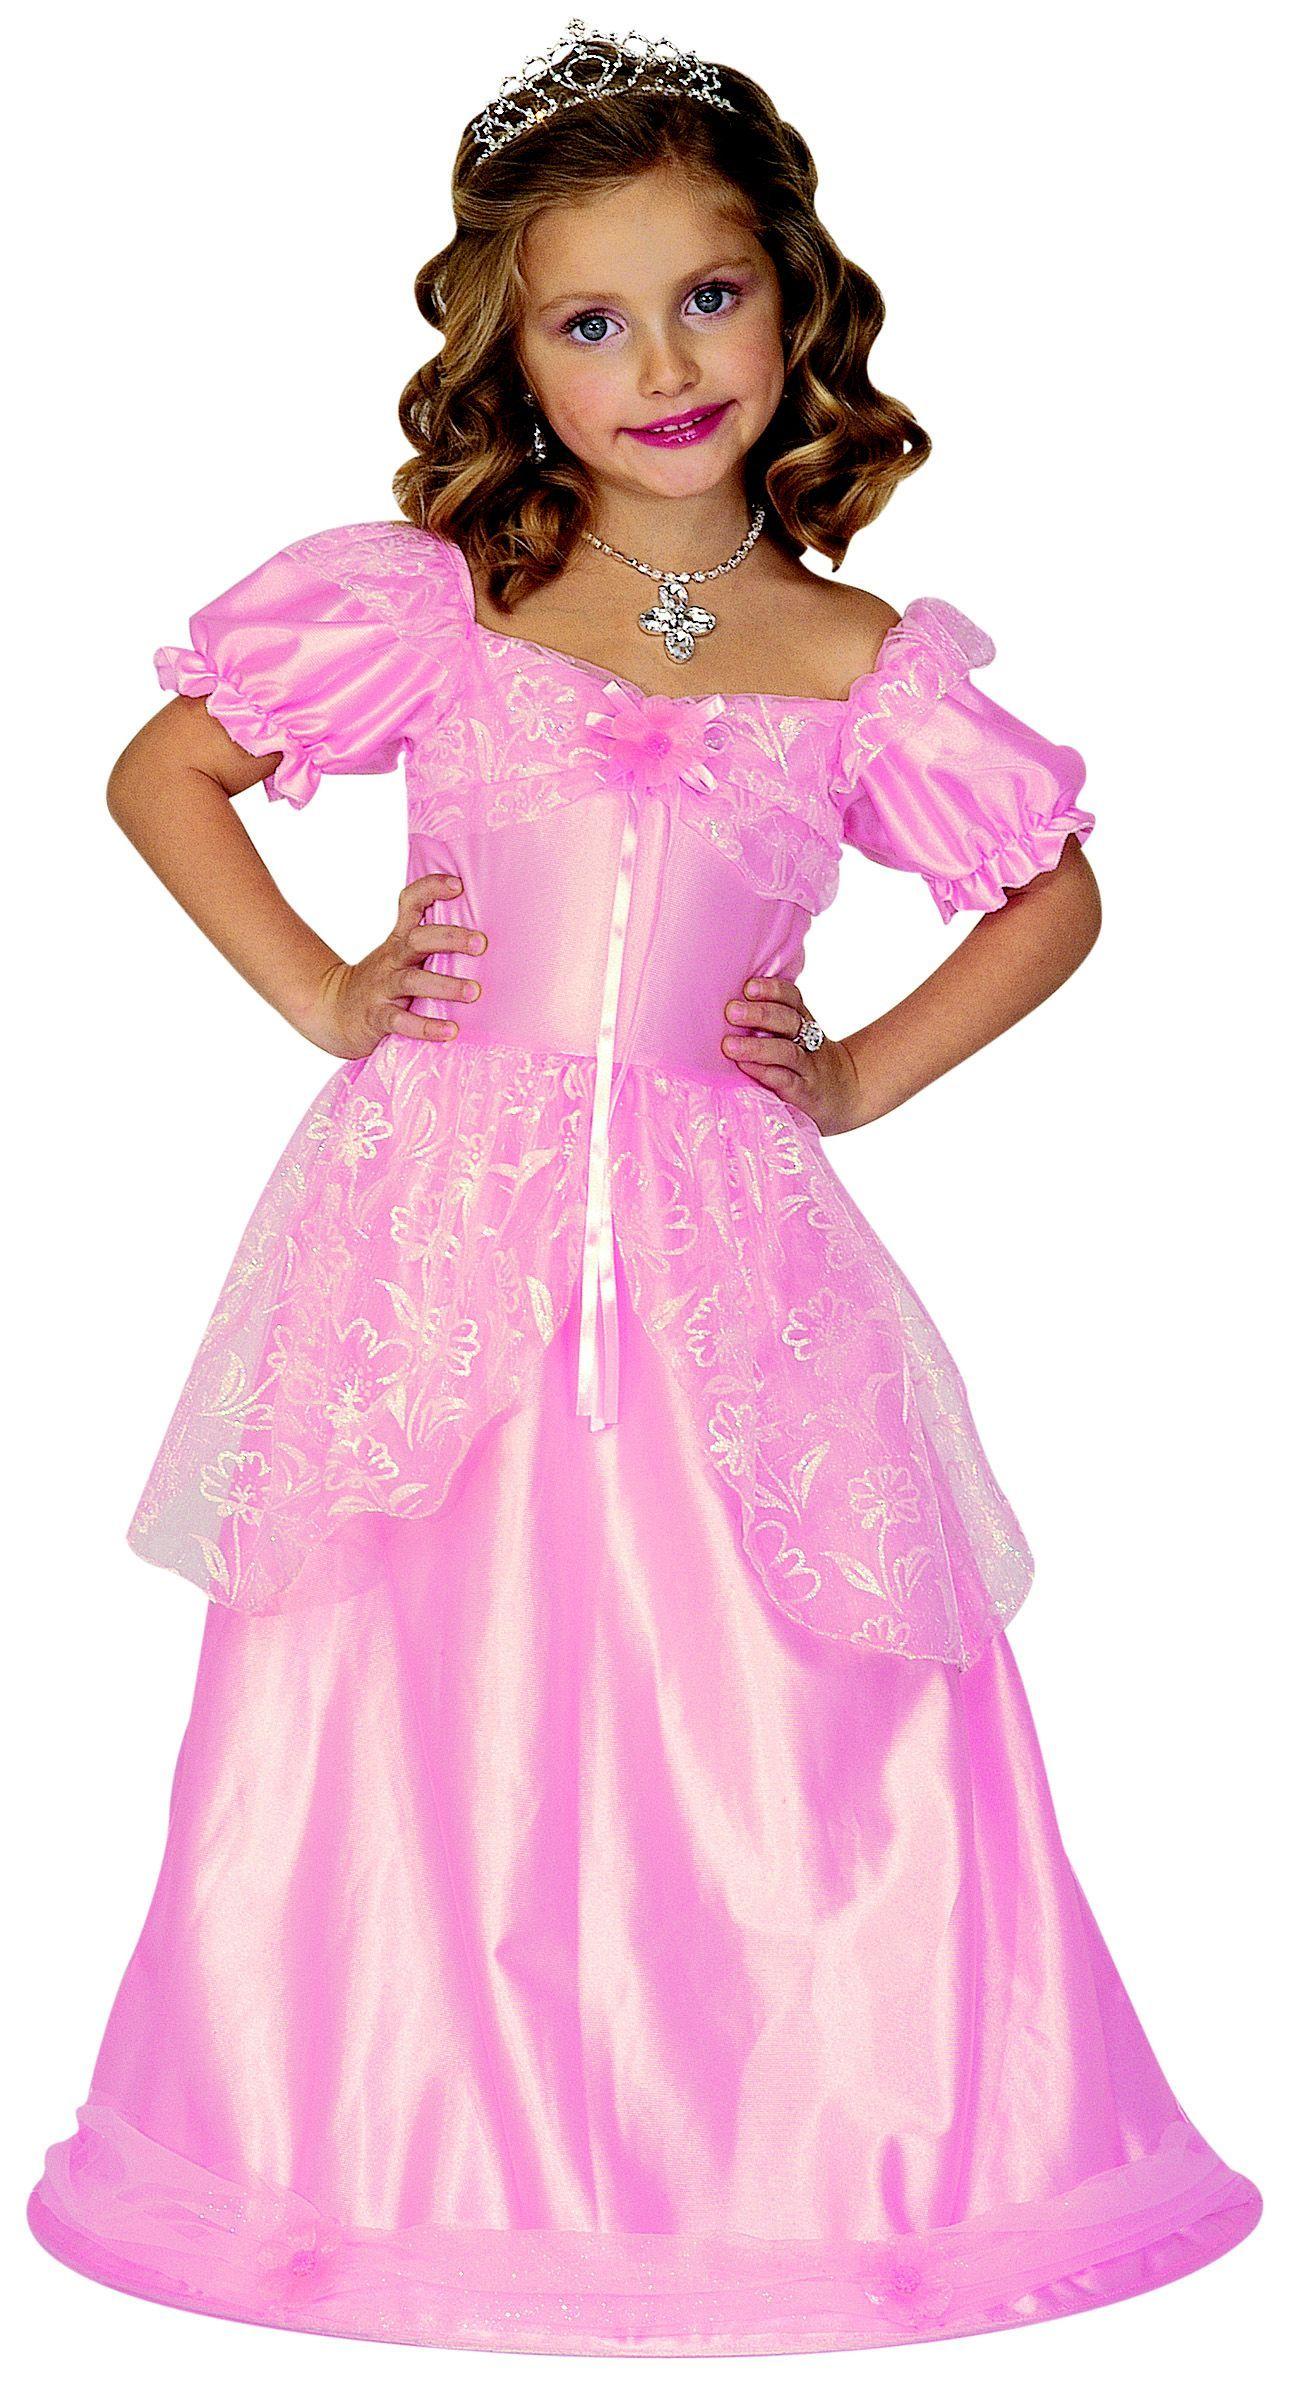 3249fbf2b31eb Déguisement princesse fille   Ce déguisement de princesse pour fille se  compose d une robe